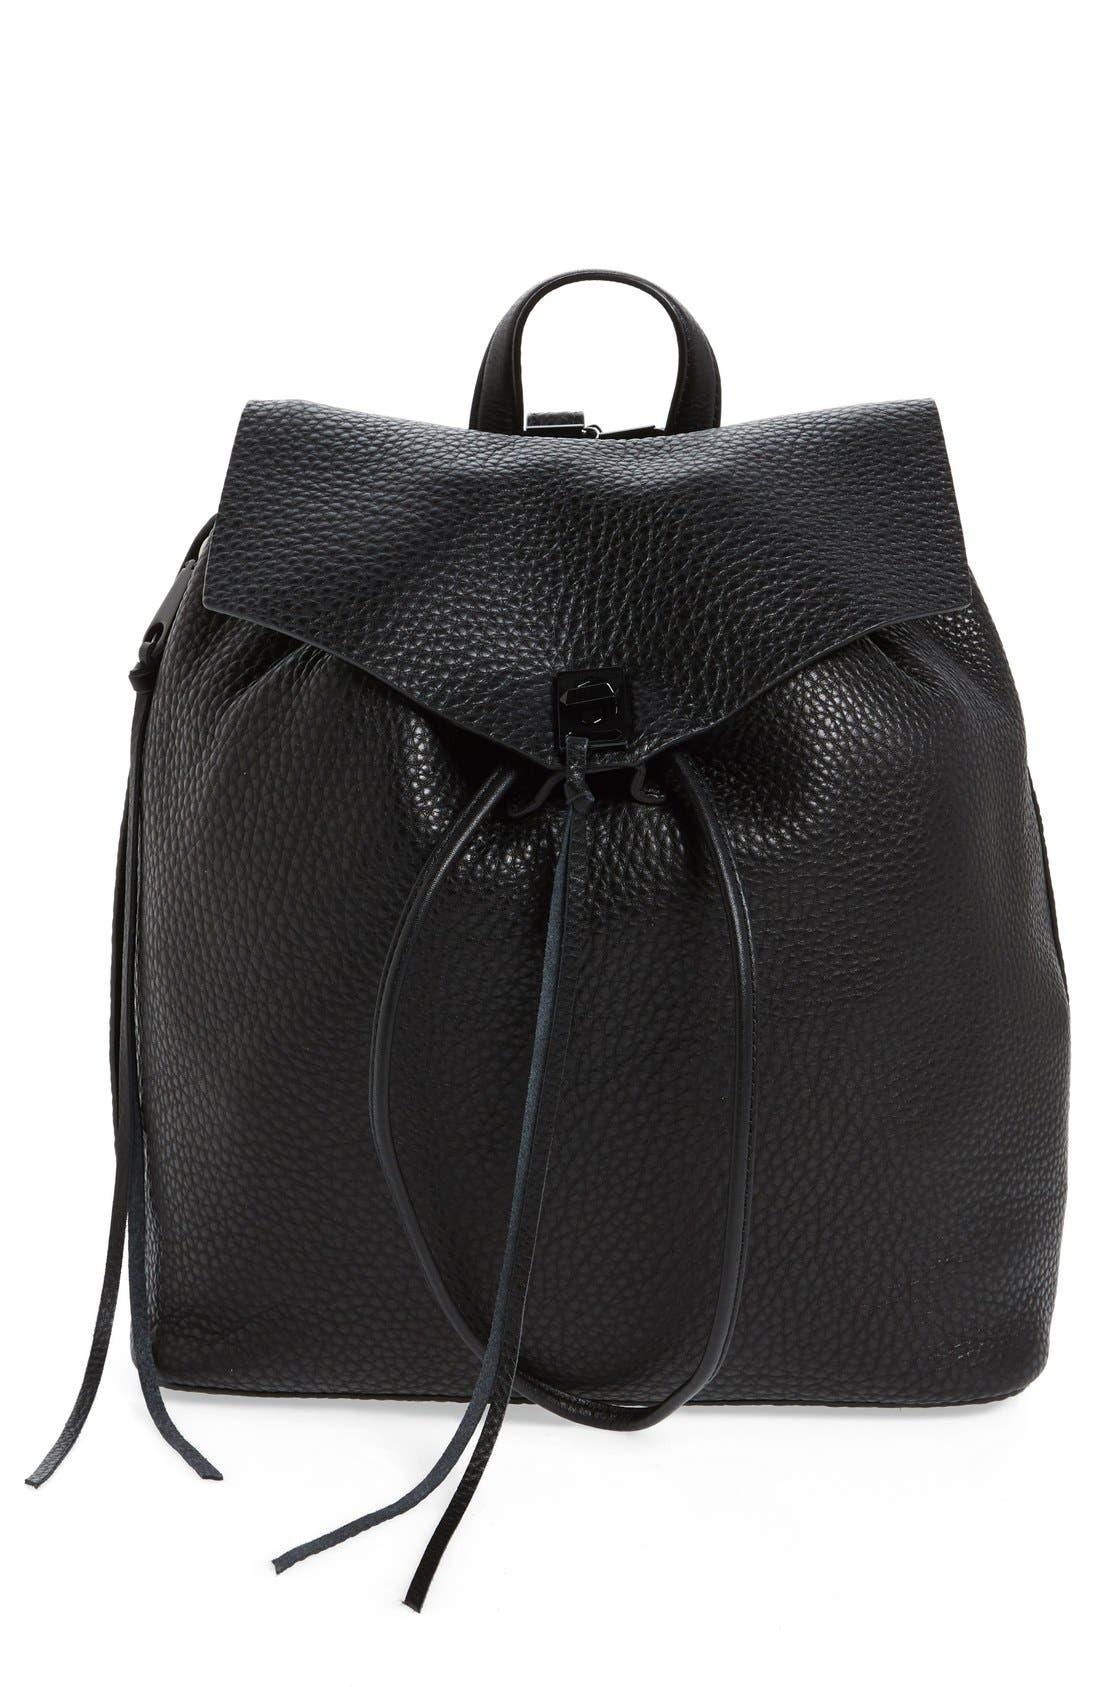 Main Image - Rebecca Minkoff Darren Leather Backpack